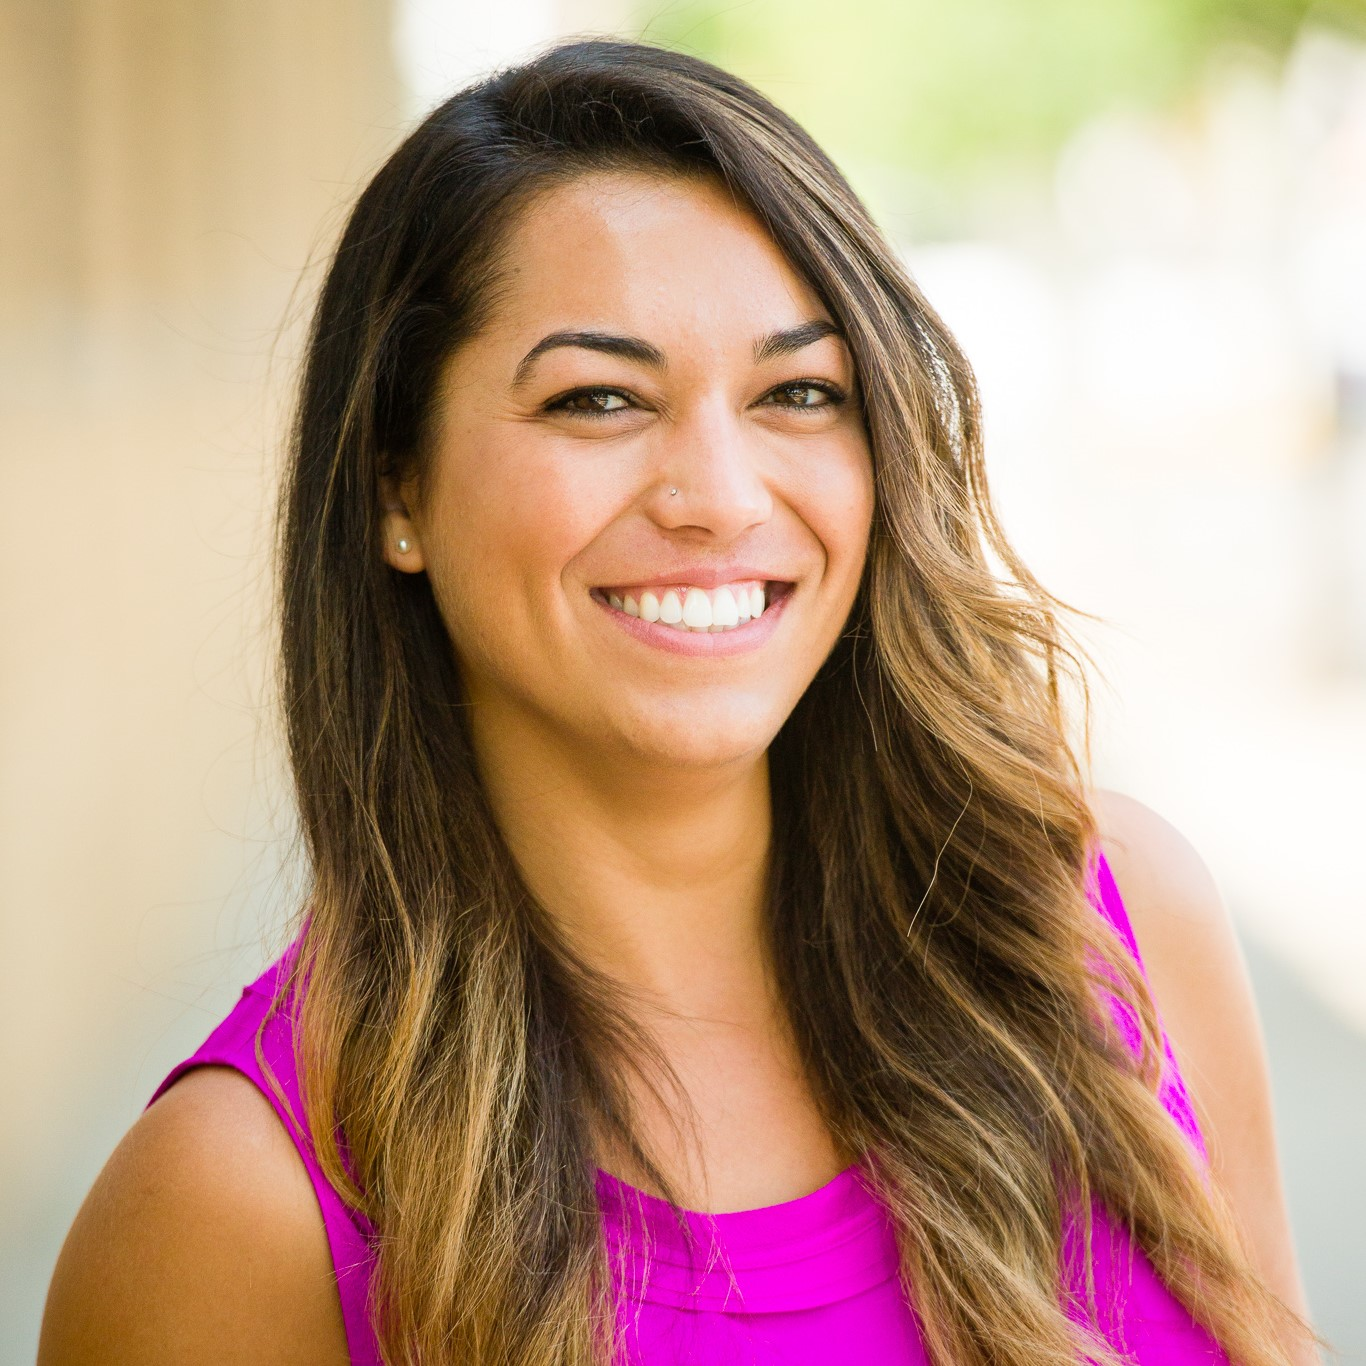 Meet Veronica Hogg-Cornejo, MS '17 | VP of Engineering | Cast21, Inc.